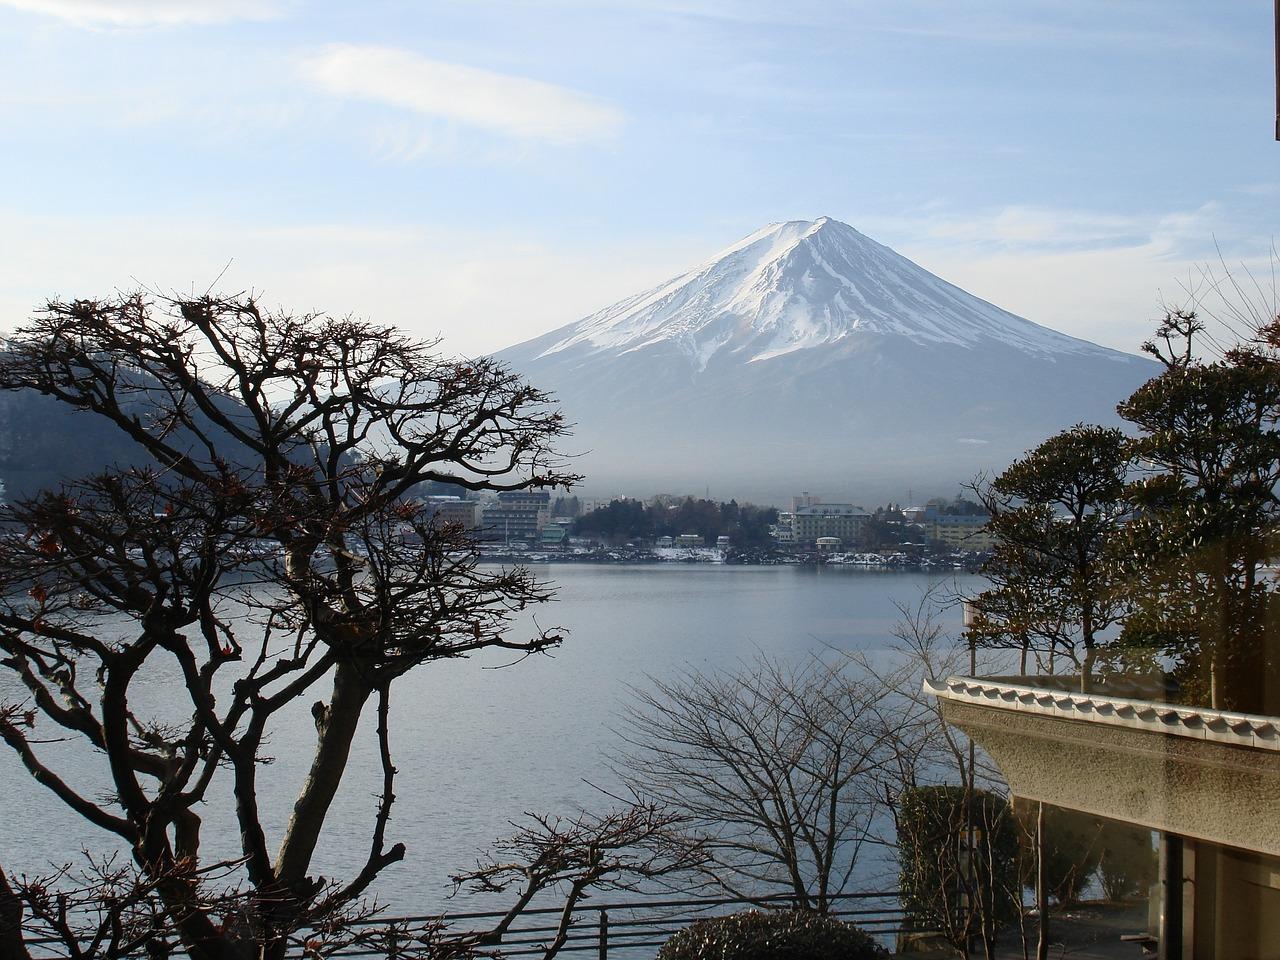 Mt Fuji scenery